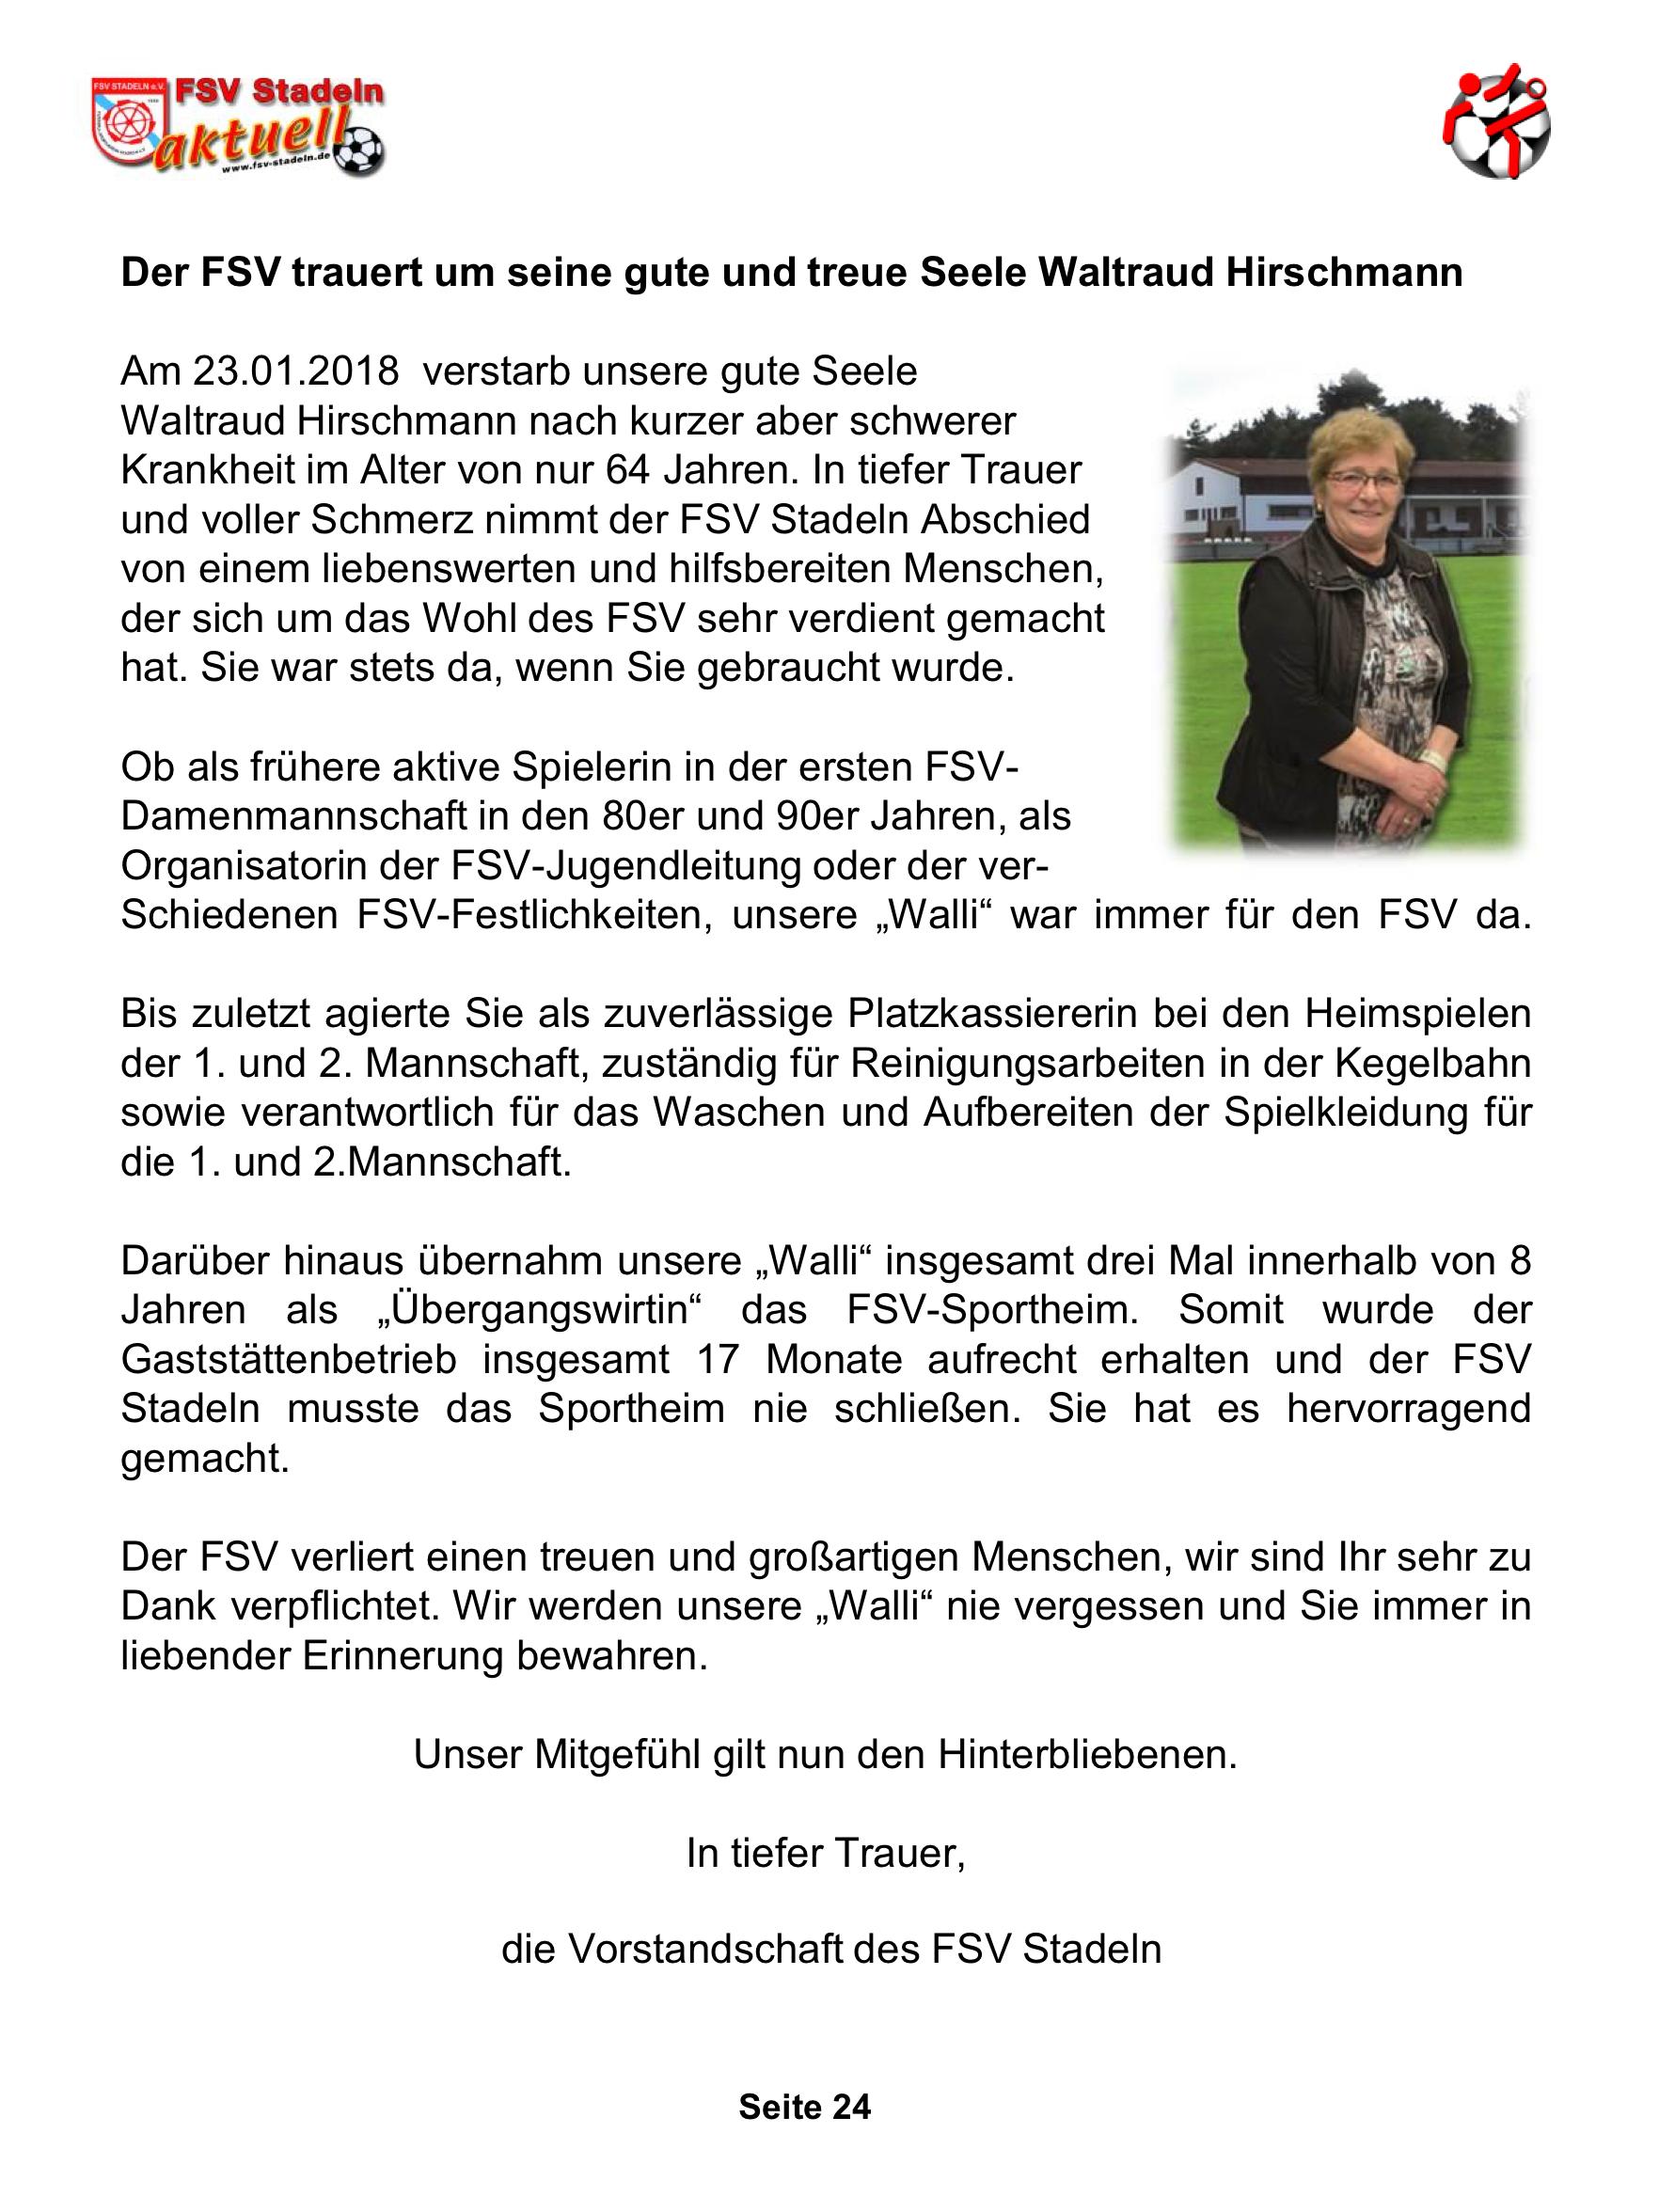 FC-Herzogenaurach-24.png